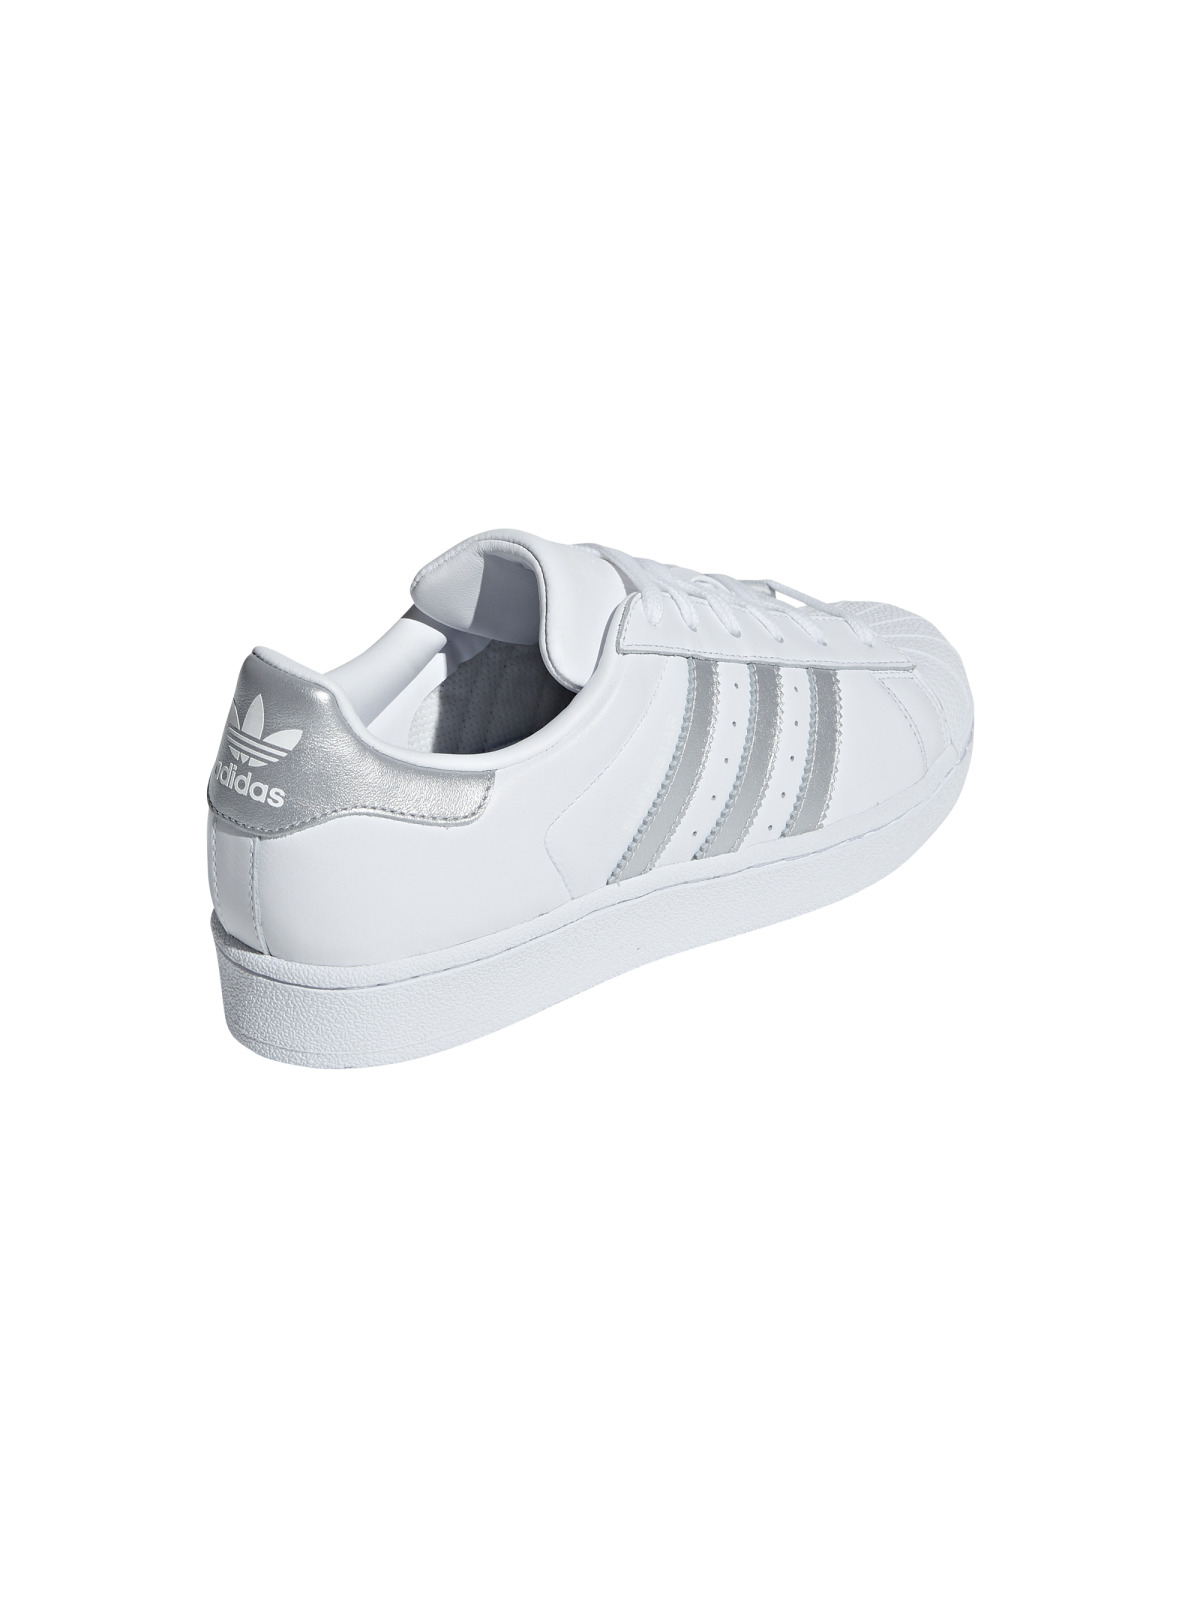 adidas superstar blanc et gris